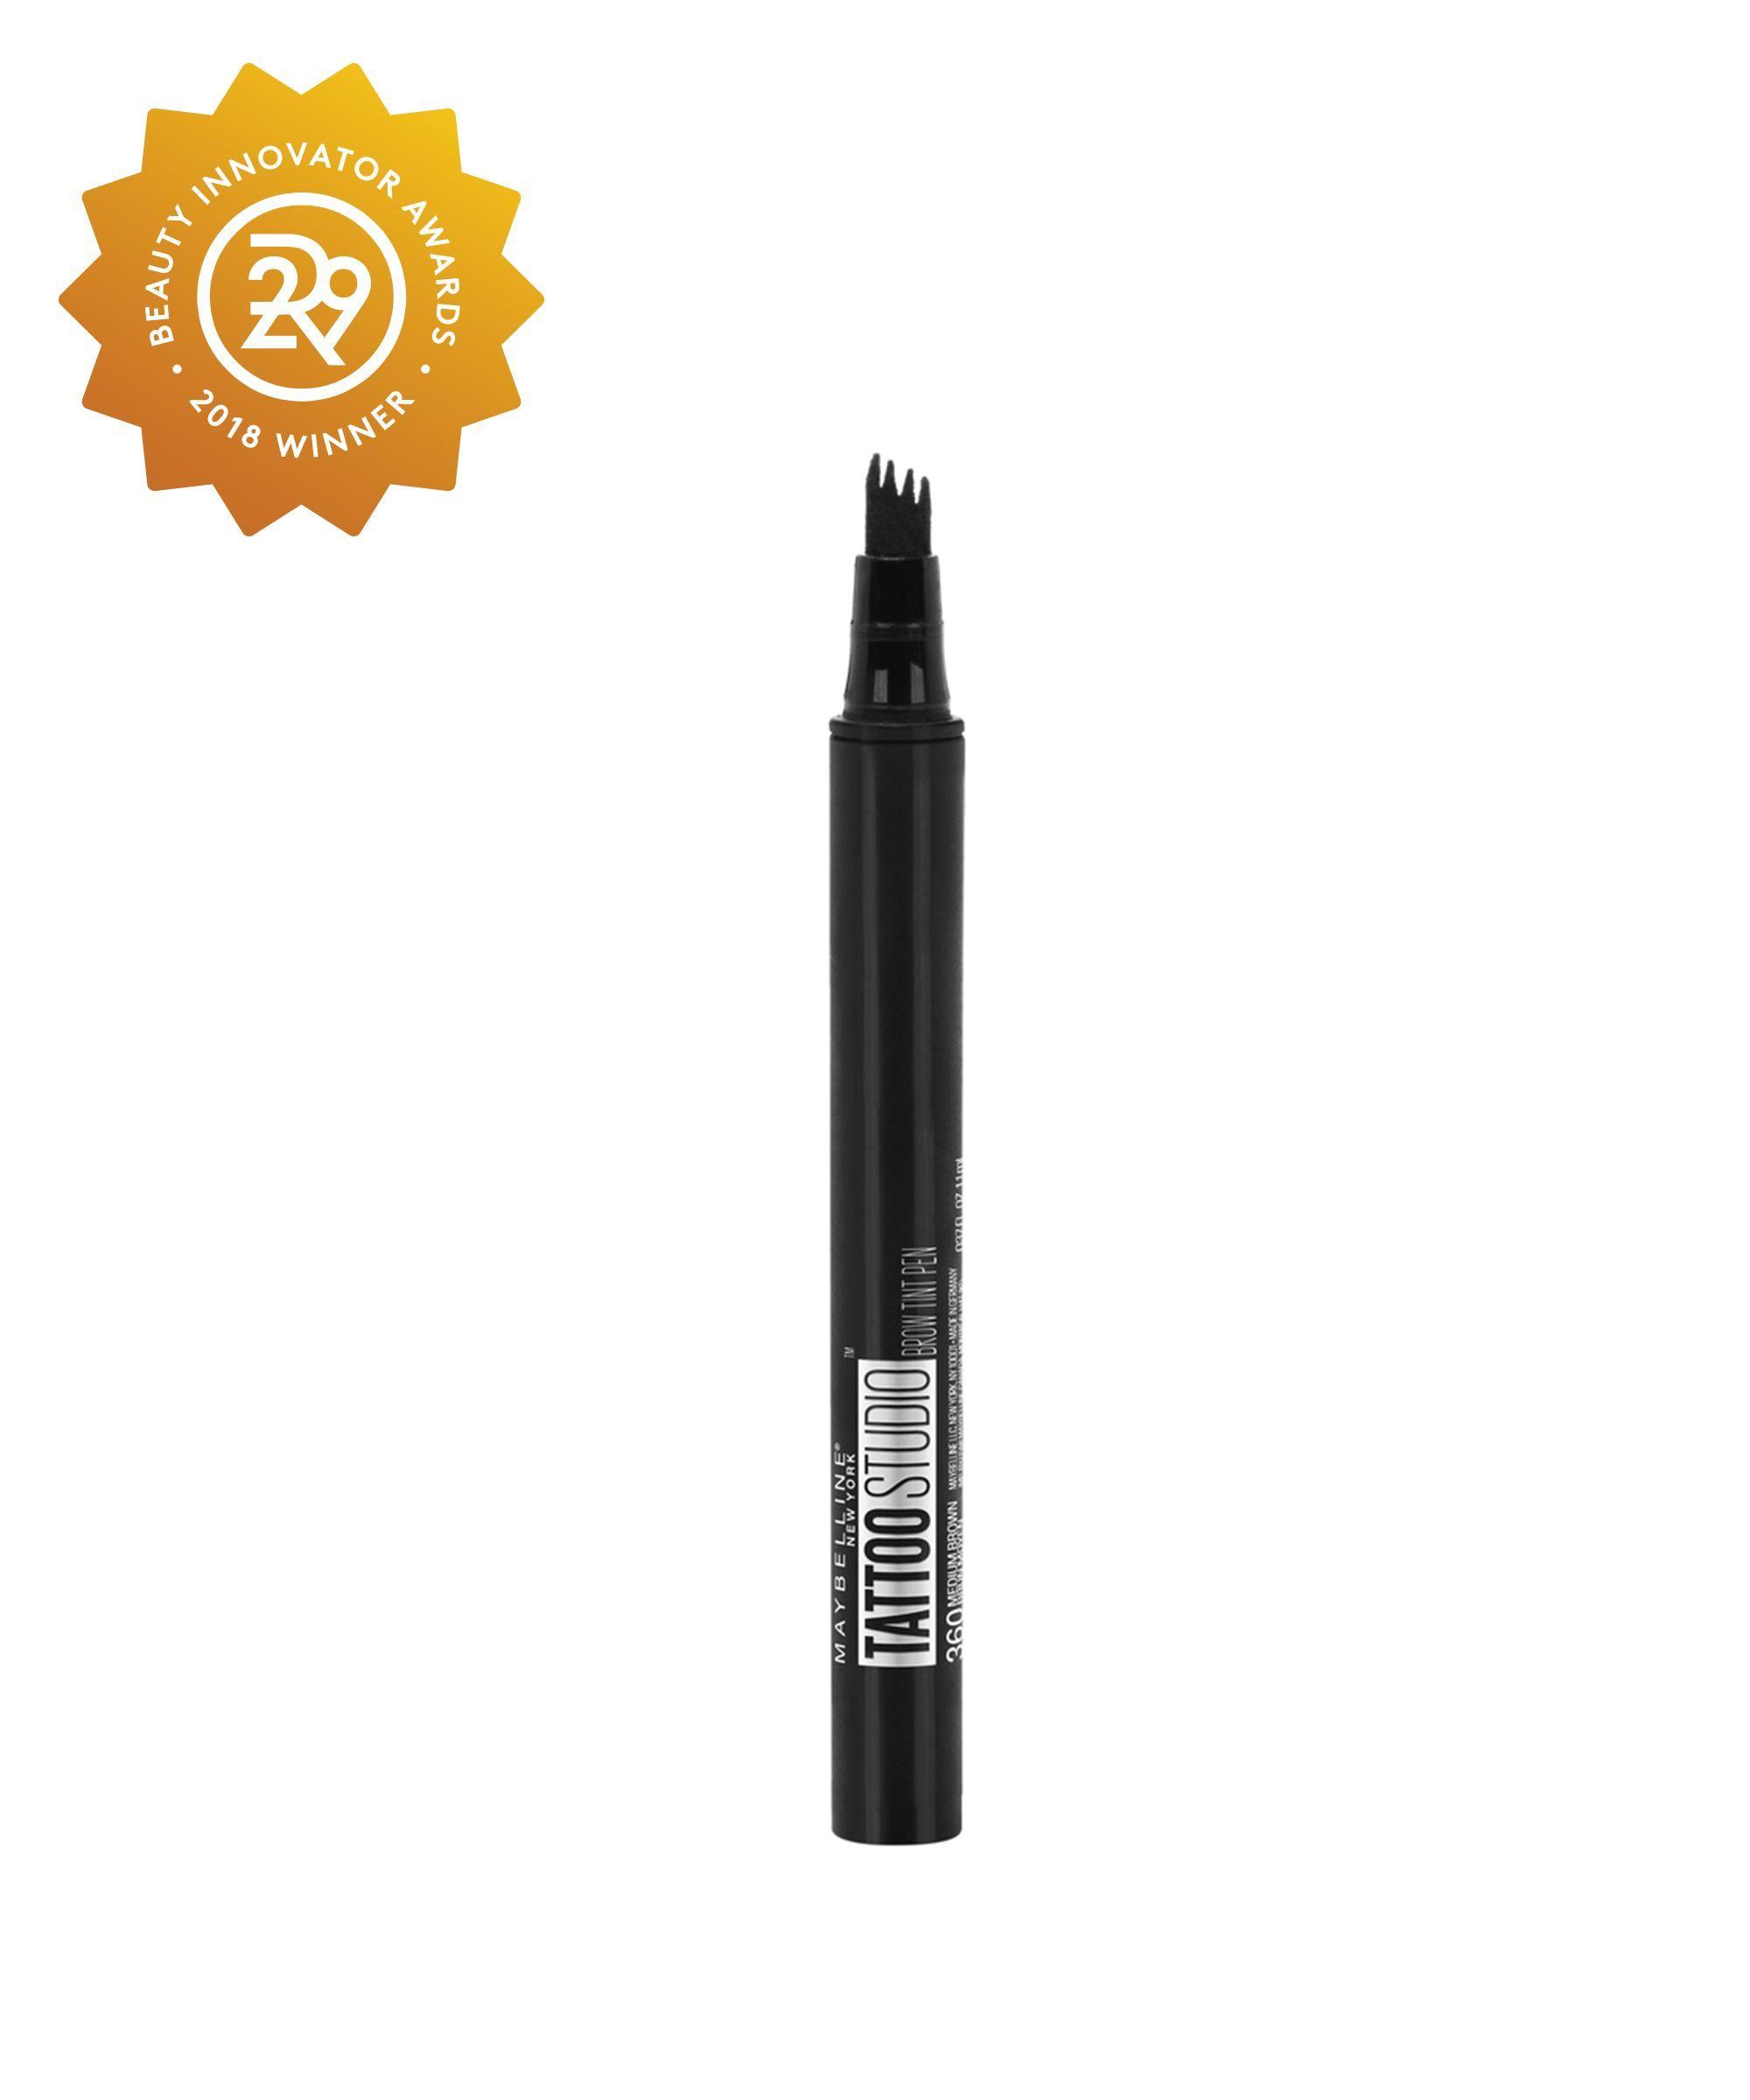 Tattoostudio Brow Tint Pen Eyebrow Makeup Products Best Eyebrow